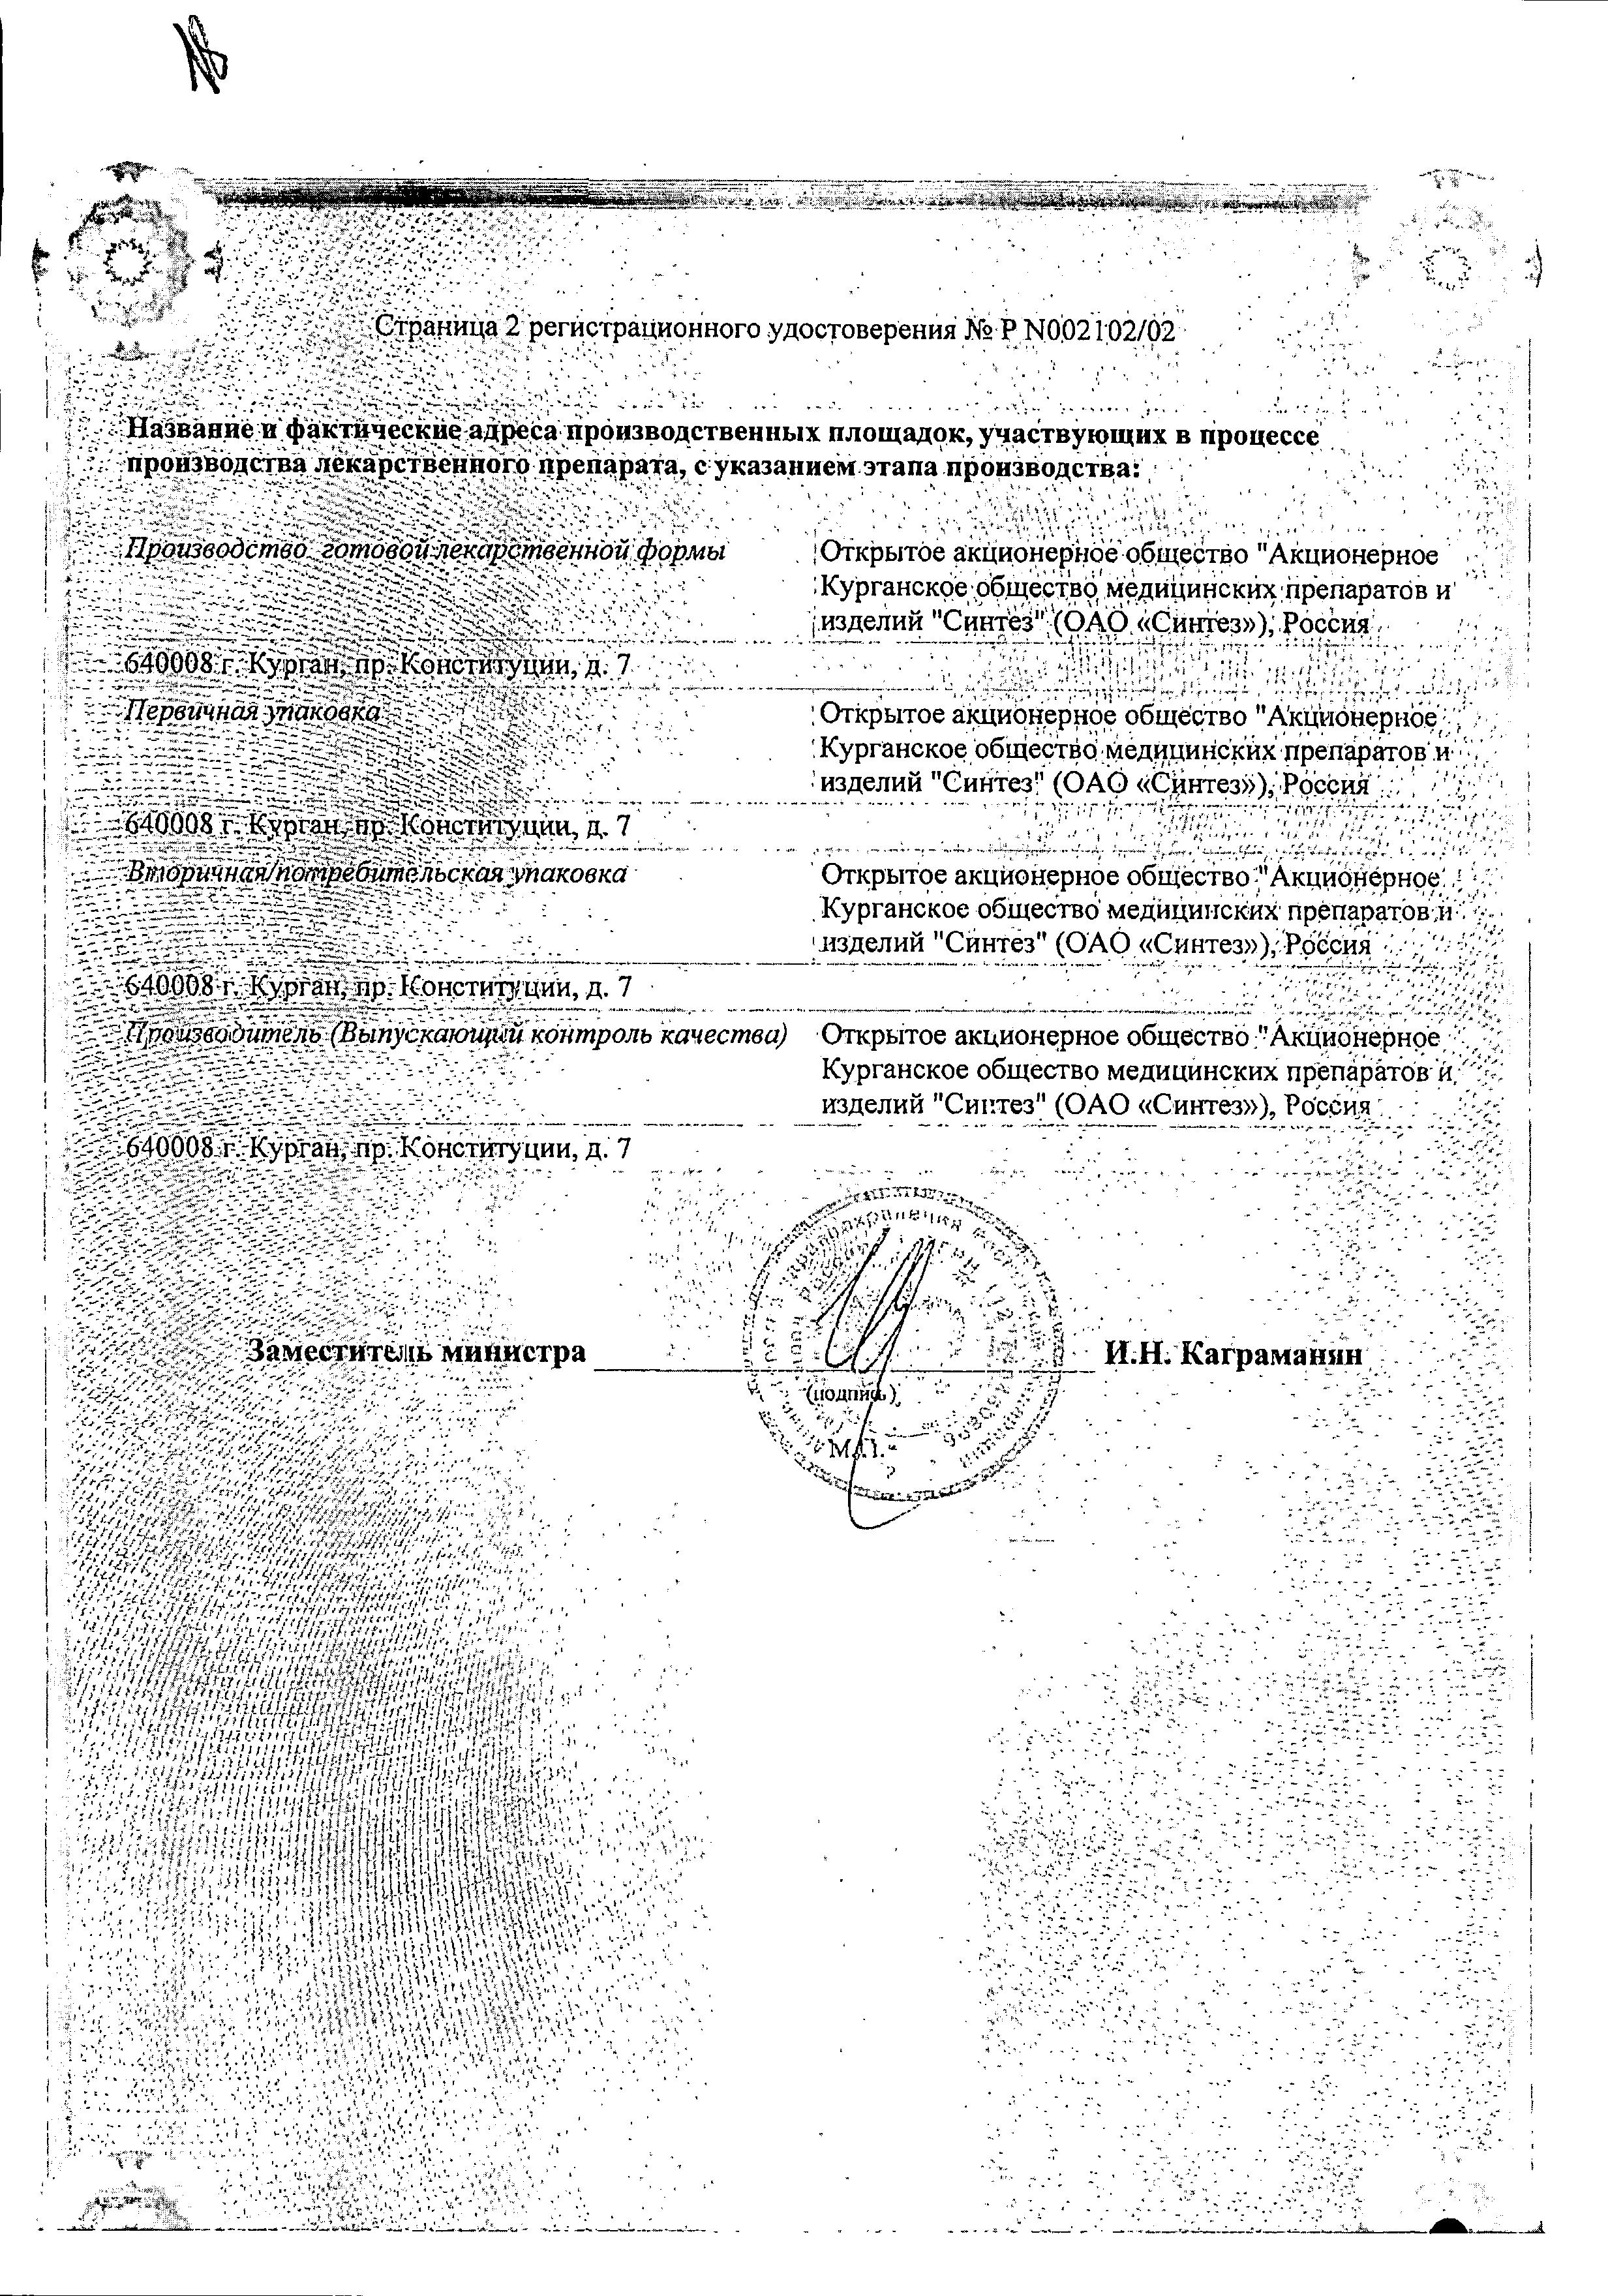 Цефосин сертификат